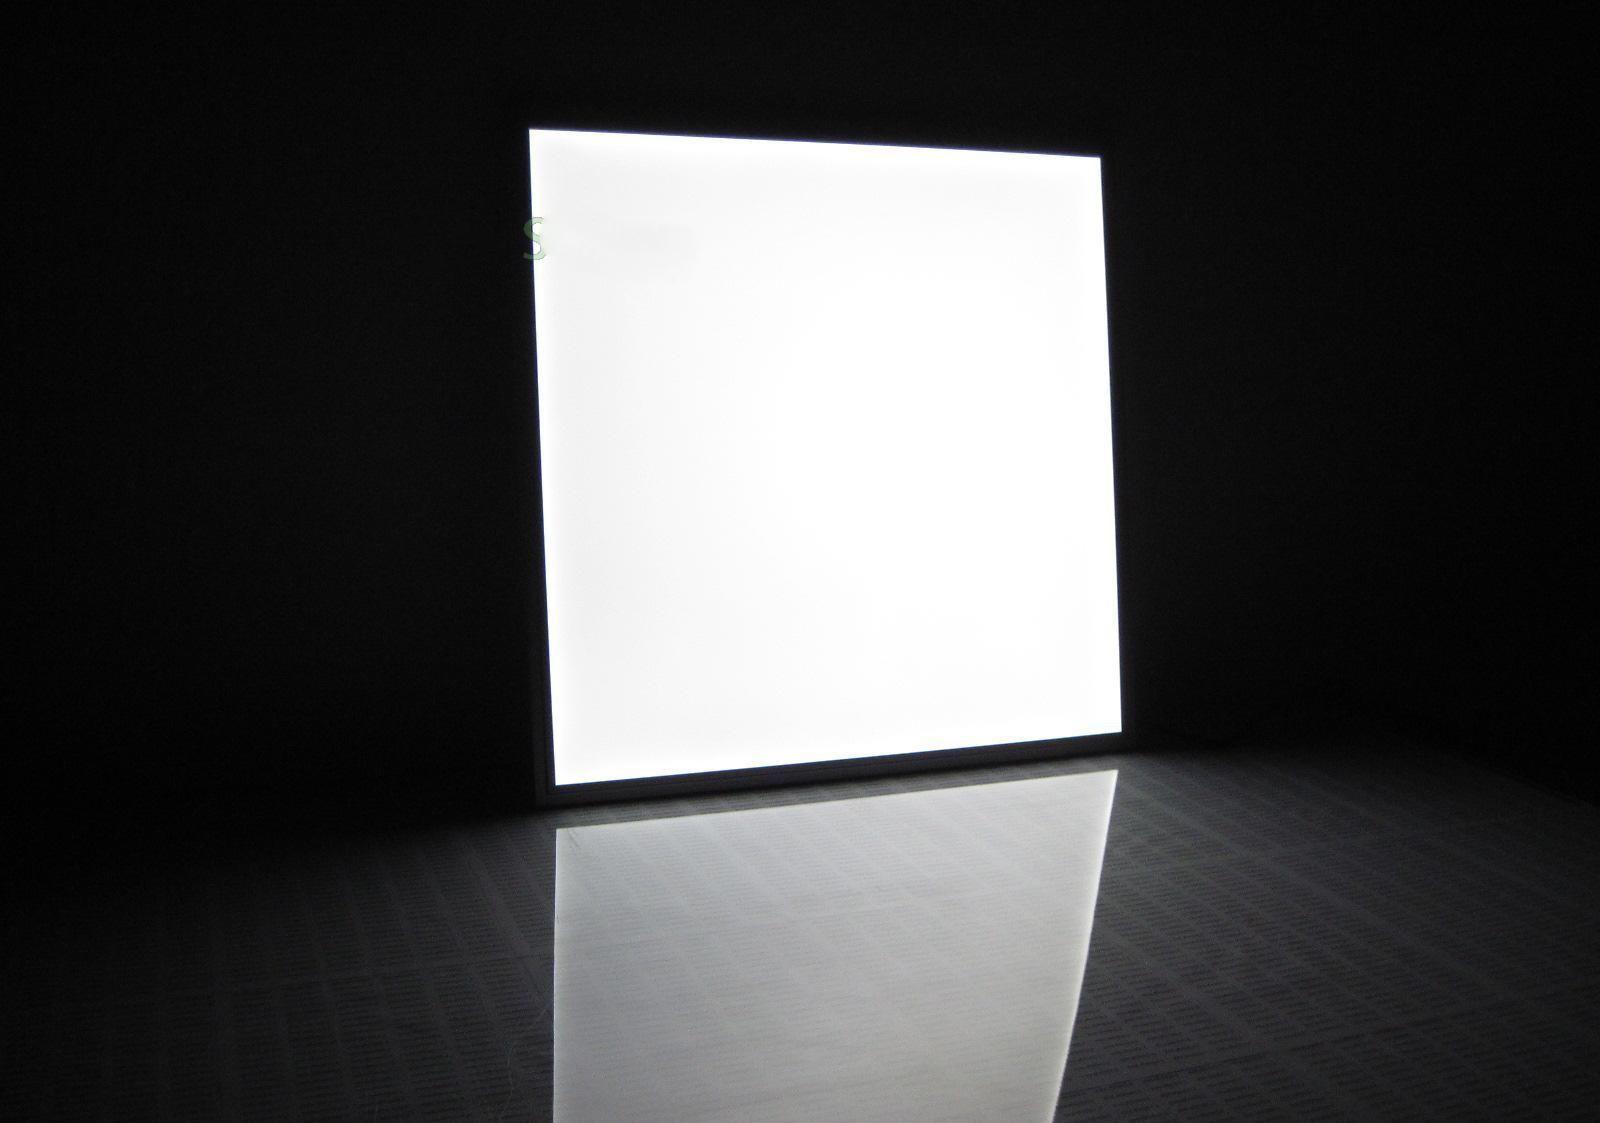 Plafoniera Led Quadrata 48w : Led panel pannelli pannello w